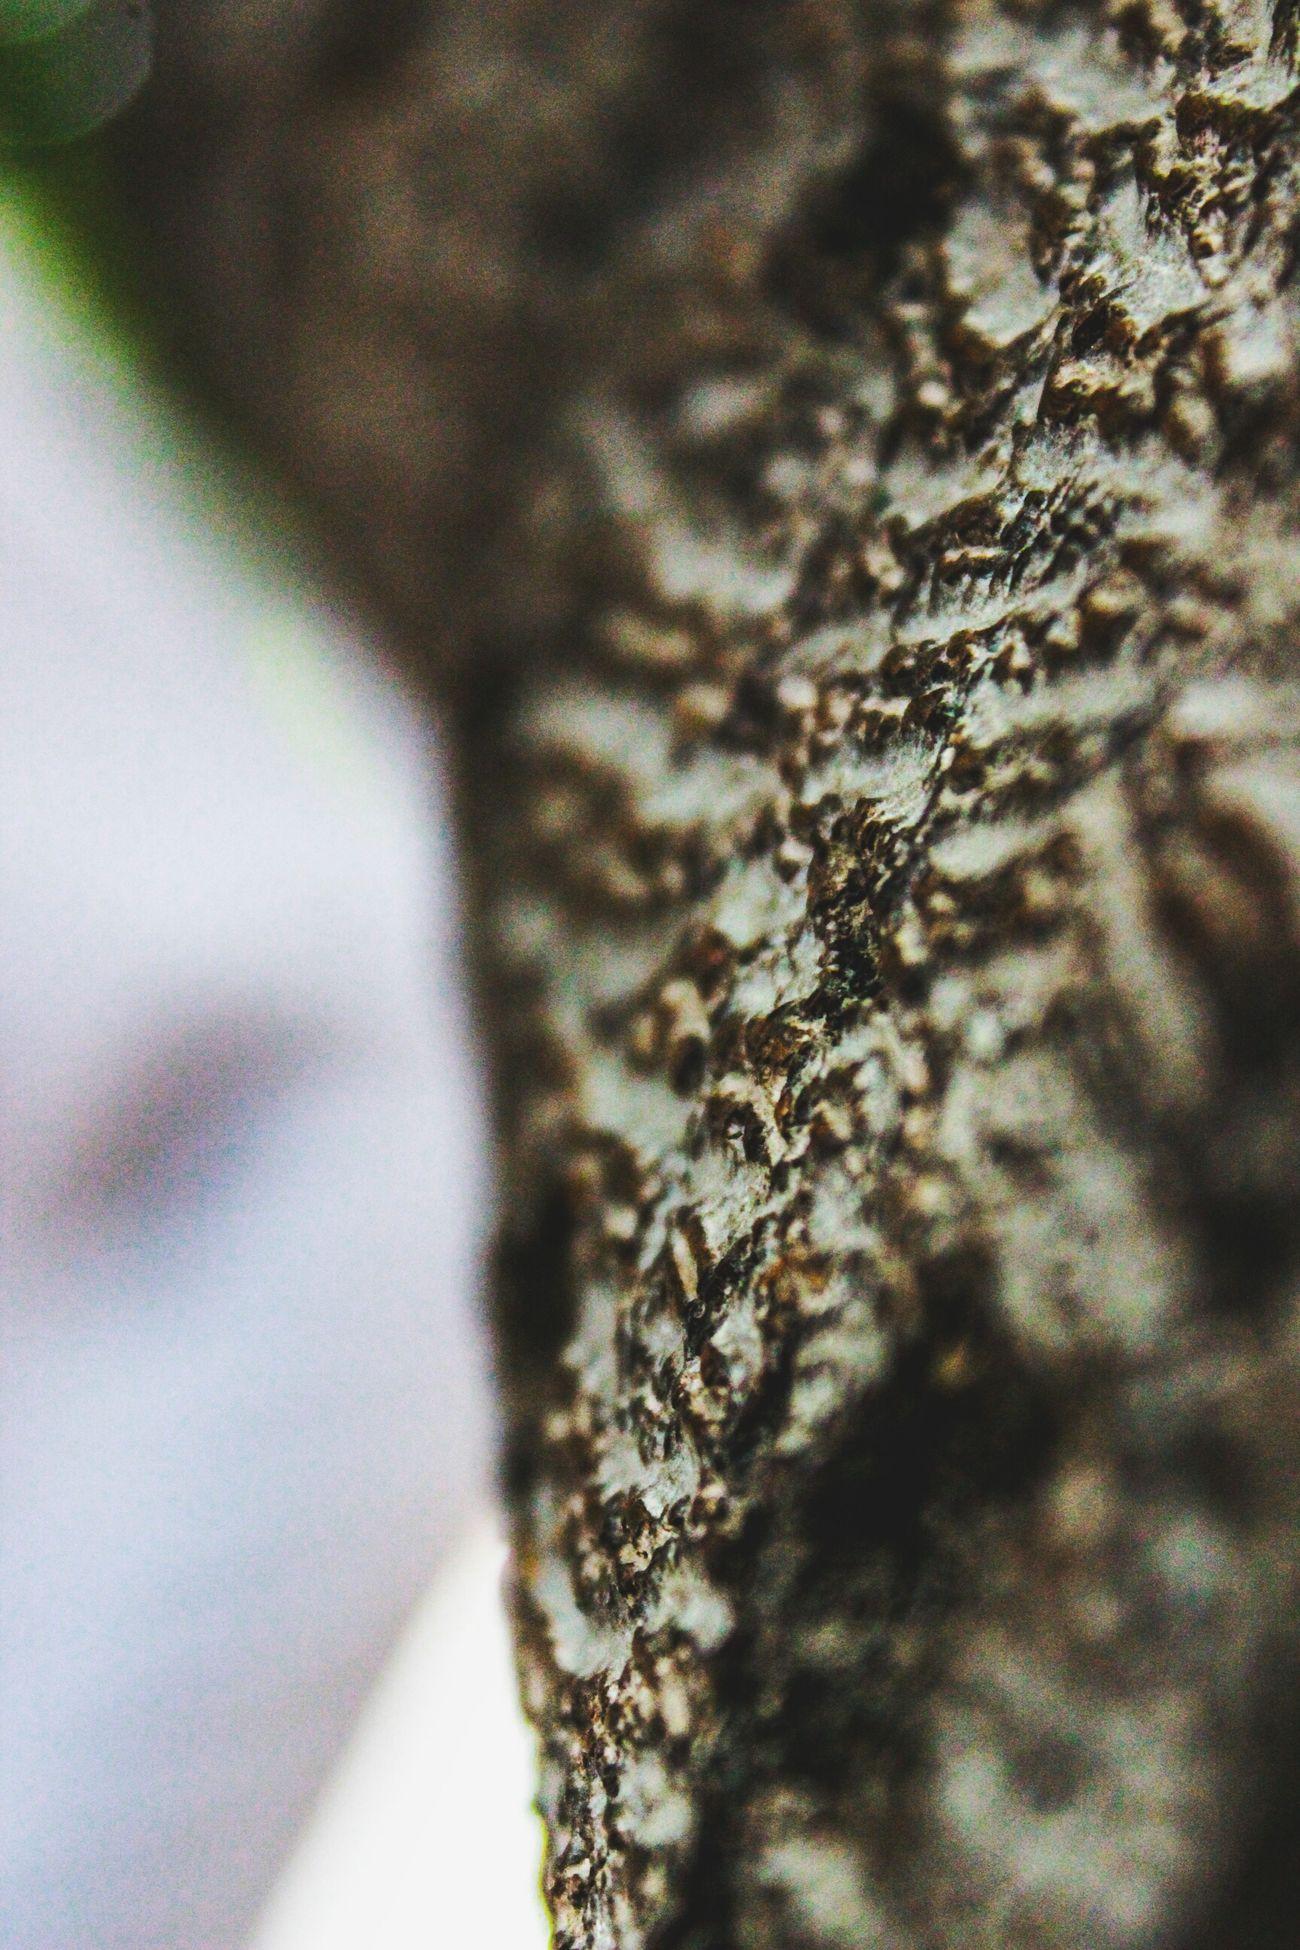 - Tree Texture. Maximum Closeness Beauty In Nature Close-up No People Day Outdoors Tree Texture TreePorn Treetastic Trees And Sky Tree And Sky Tree Bark Trees Collection Tree Branches Treetop Tree Trunk Tree Tree Roots  Tree Stump Tree Of Life Tree Porn Treelined Trees And Nature Tree Roots  Treelovers